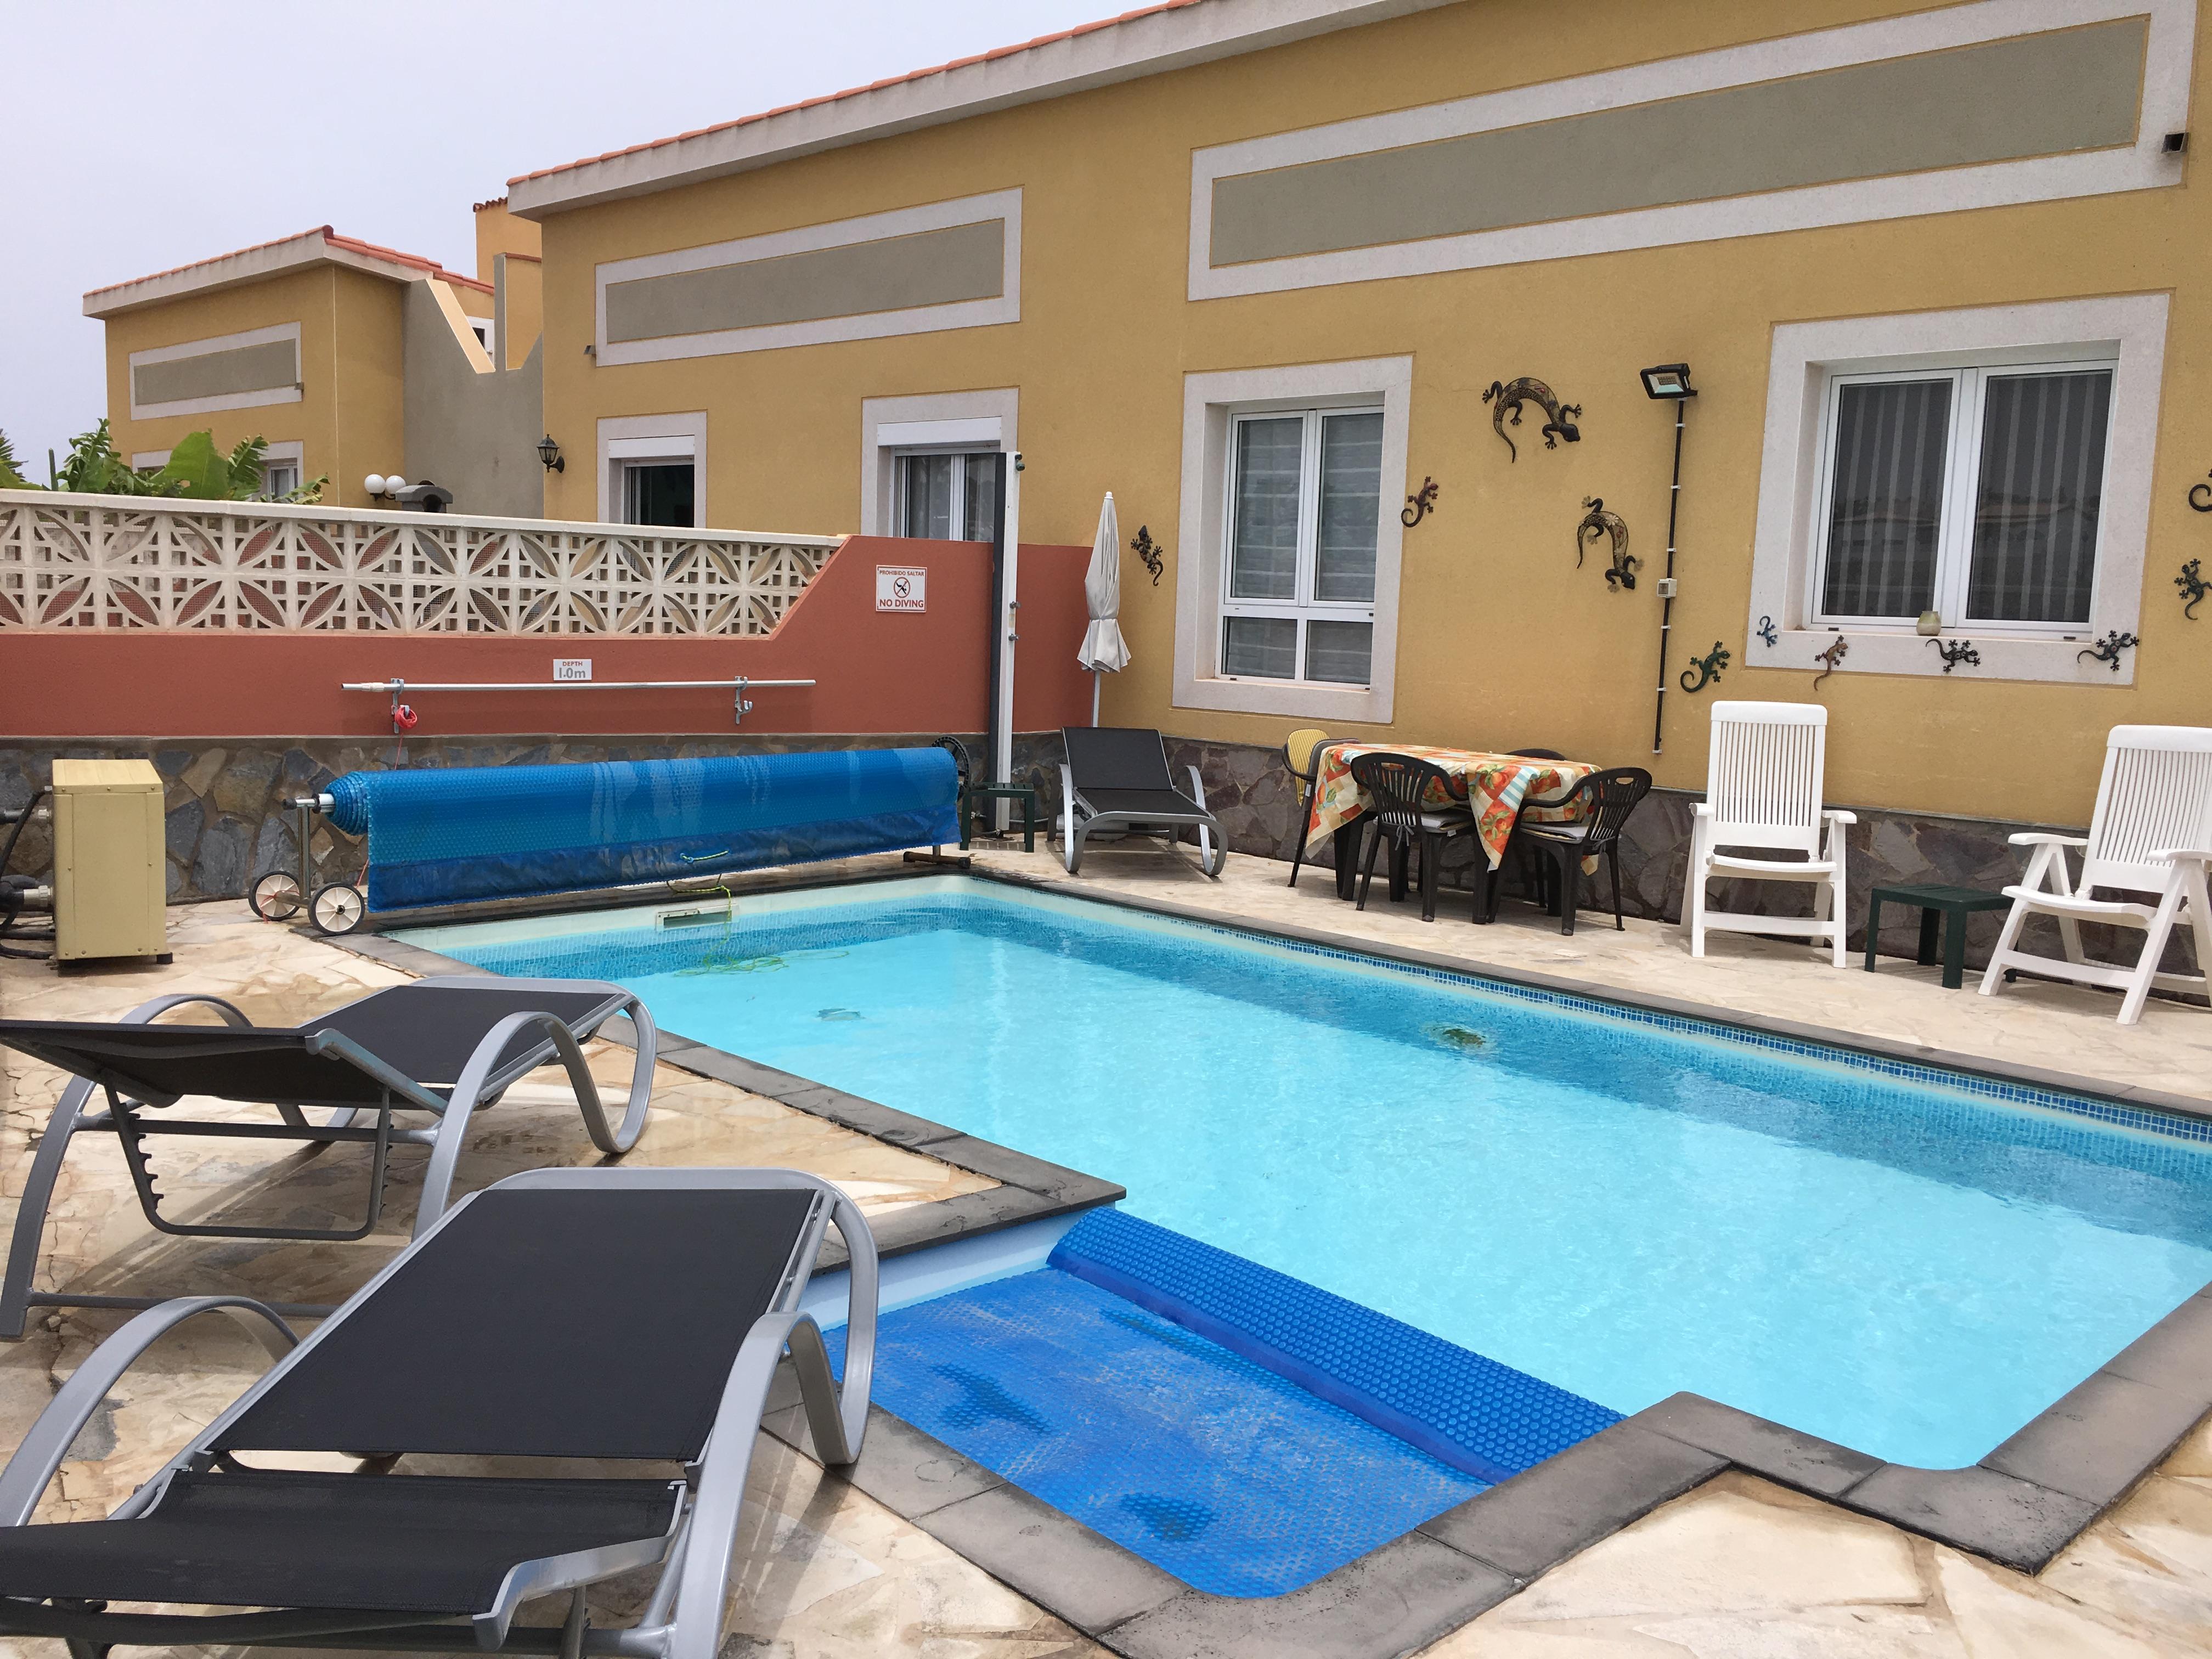 2 bedroom villa in caleta de fuste fuerteventura for Villas fuerteventura